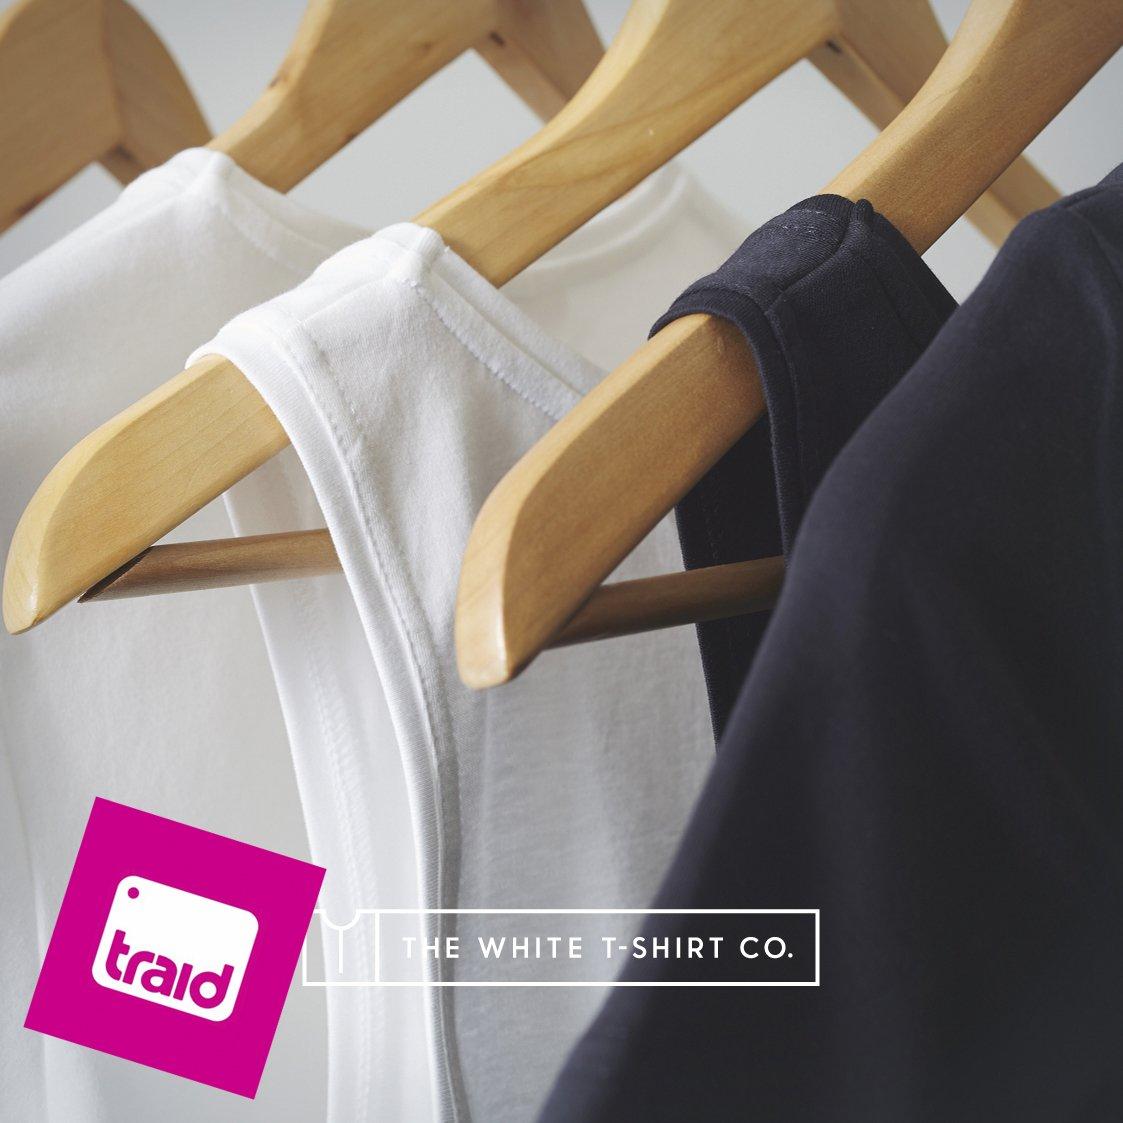 White t shirt company - Traid And The White T Shirt Co